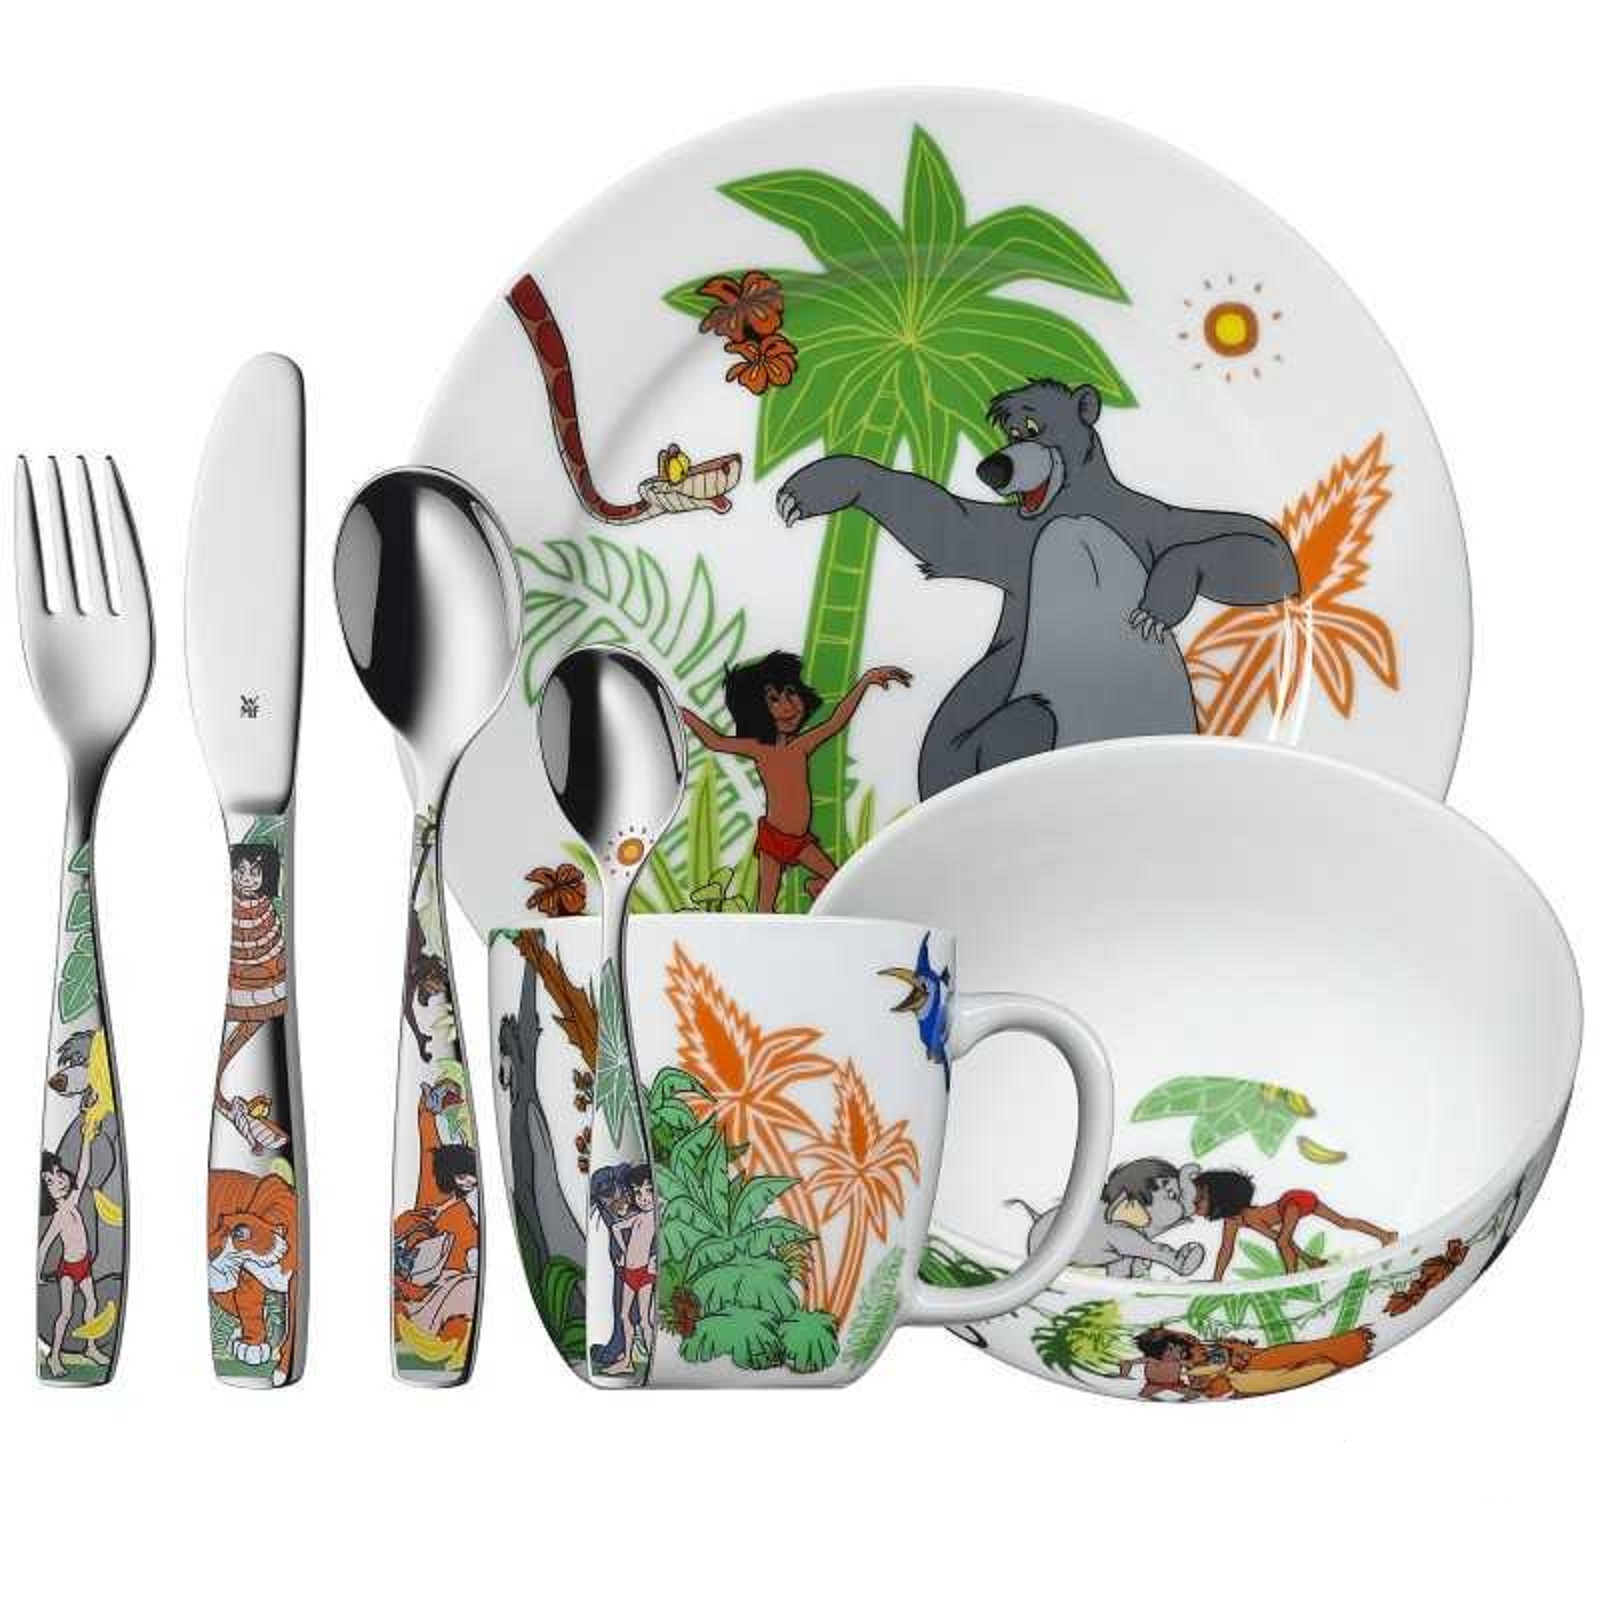 "Онлайн каталог PROMENU: Набор столовый детский ""Маугли"" WMF Jungle Book, разноцветный, 7 предметов WMF 12 8330 9974"